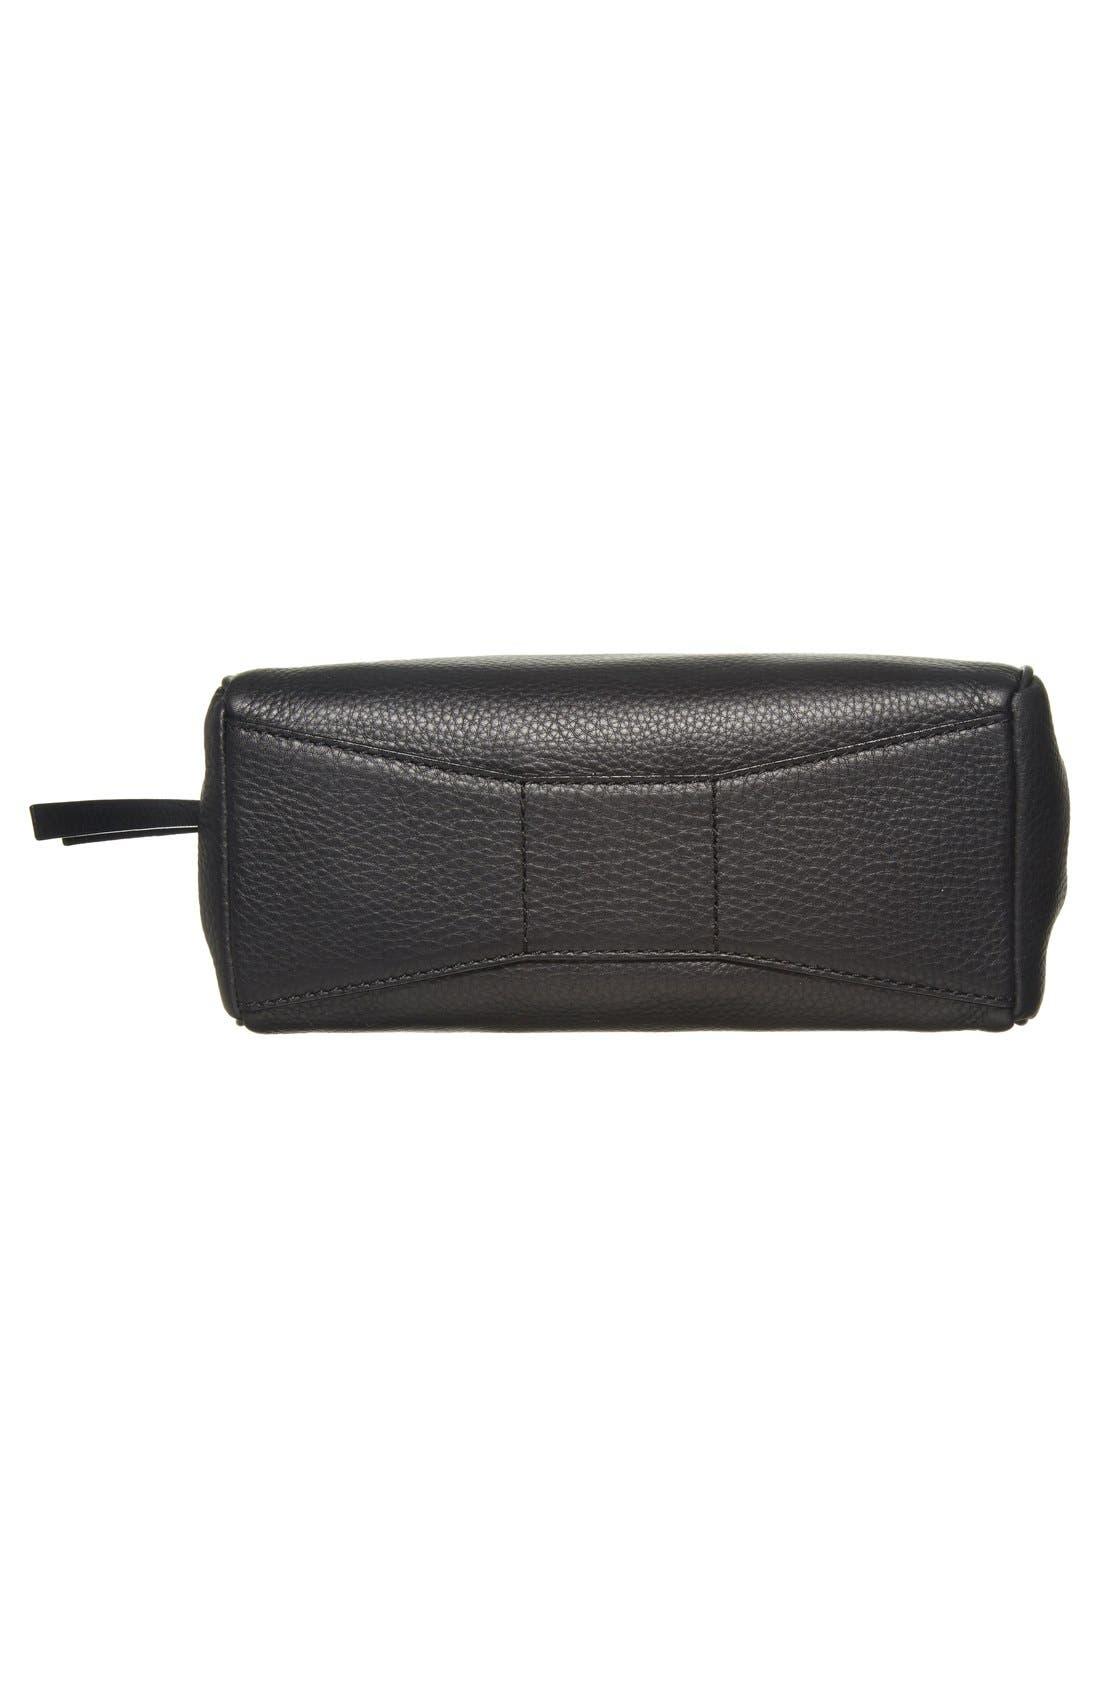 Alternate Image 3  - kate spade new york 'charles street - mini audrey' leather satchel